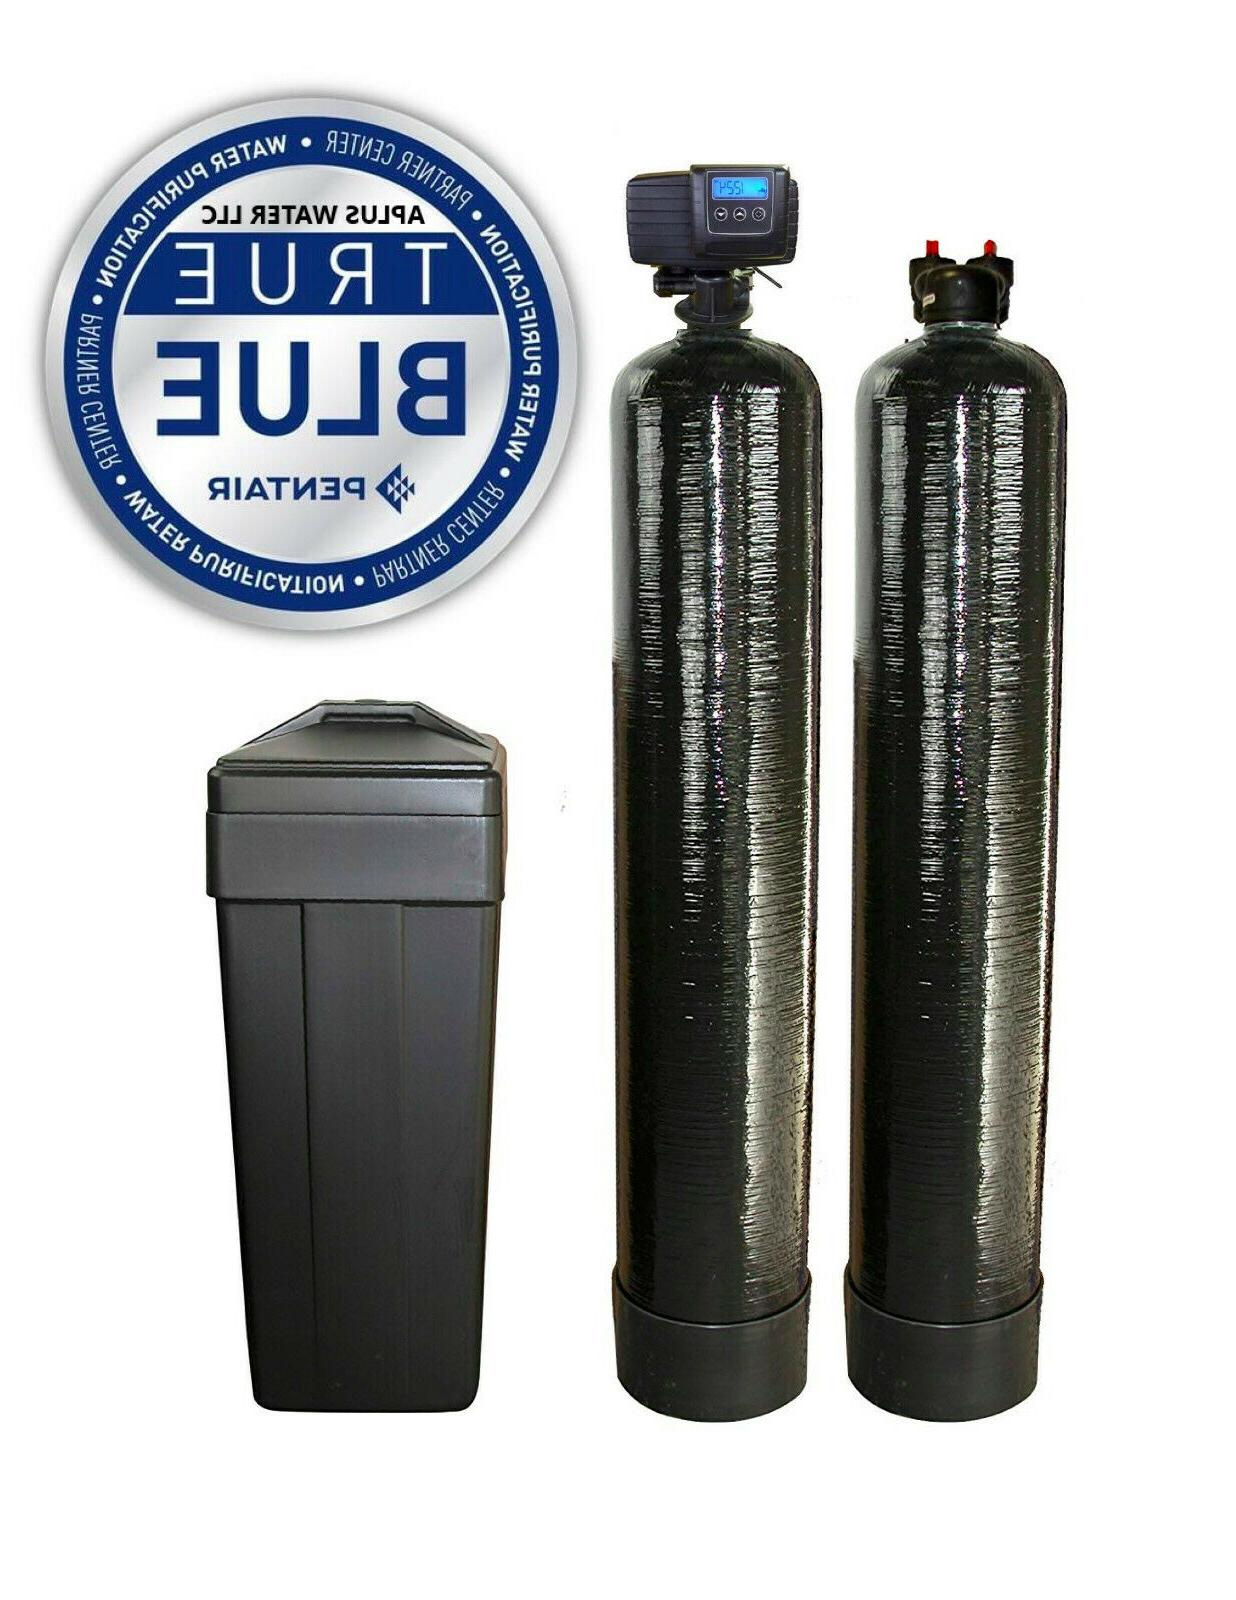 pentair 5600sxt 48 000 water softener